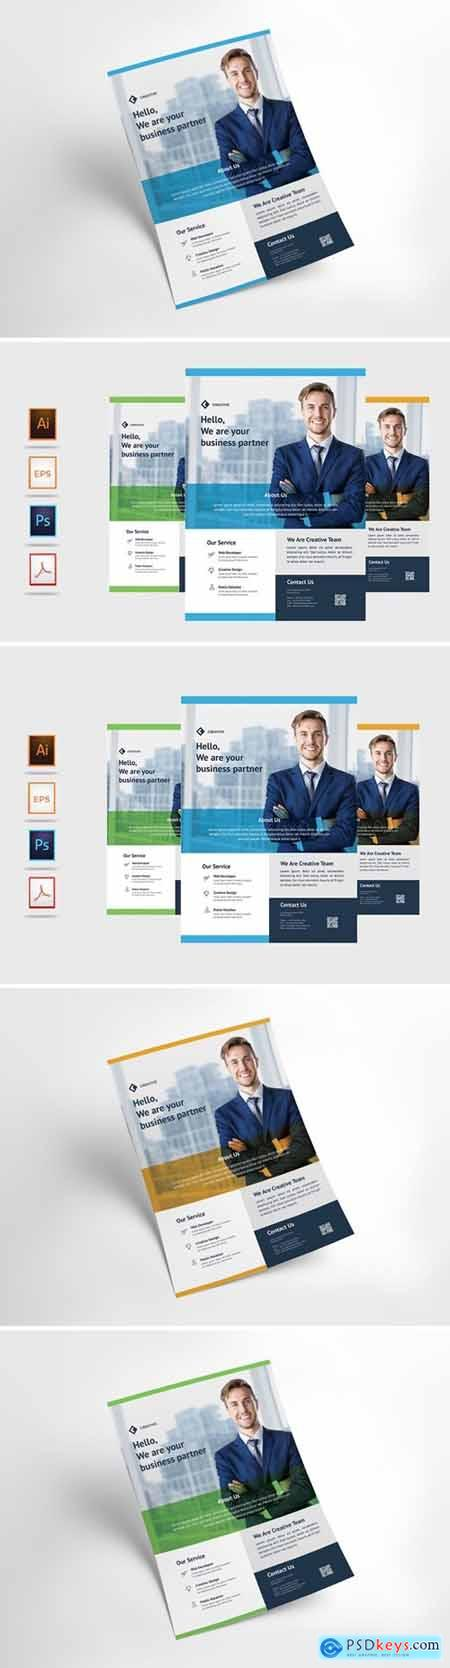 Flyer - Business Flyer